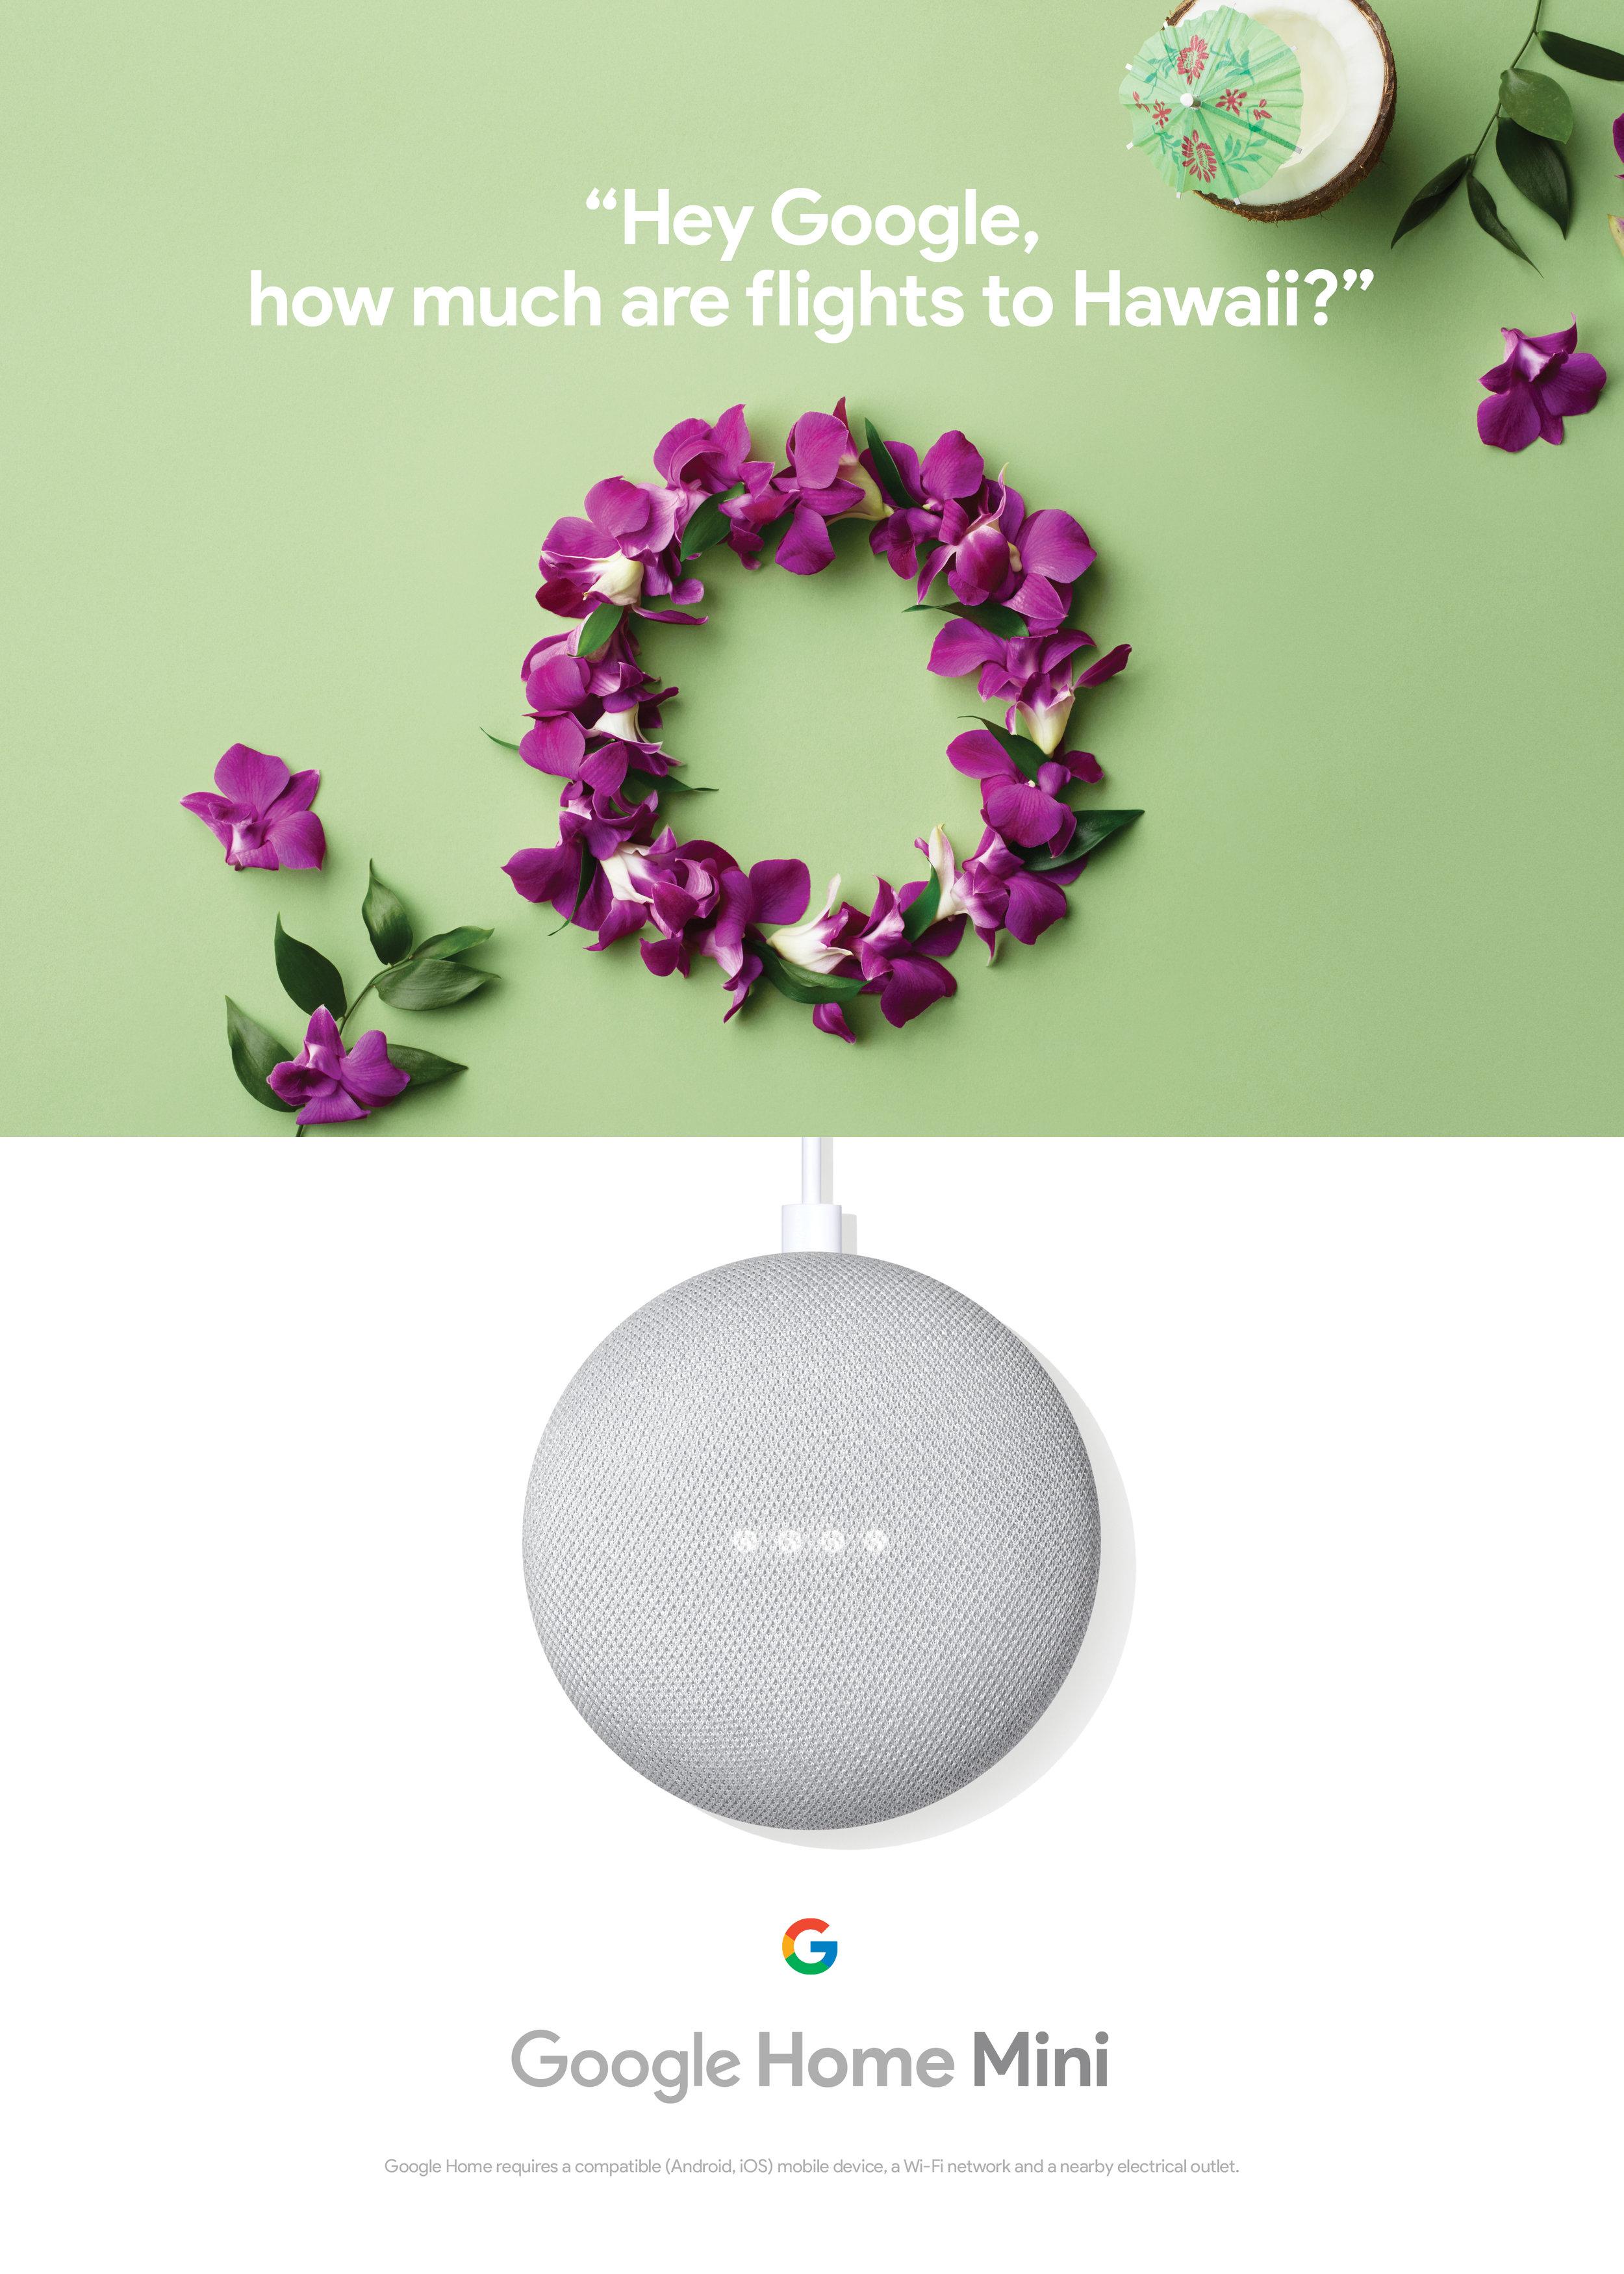 Google Home Mini Print Campaign, 2017.Photo: Vicky Lam/Westside Studio. Styling: Jeanie Lee/Plutino Group.Agency: Cossette. Art Direction: Natasha Michalowska